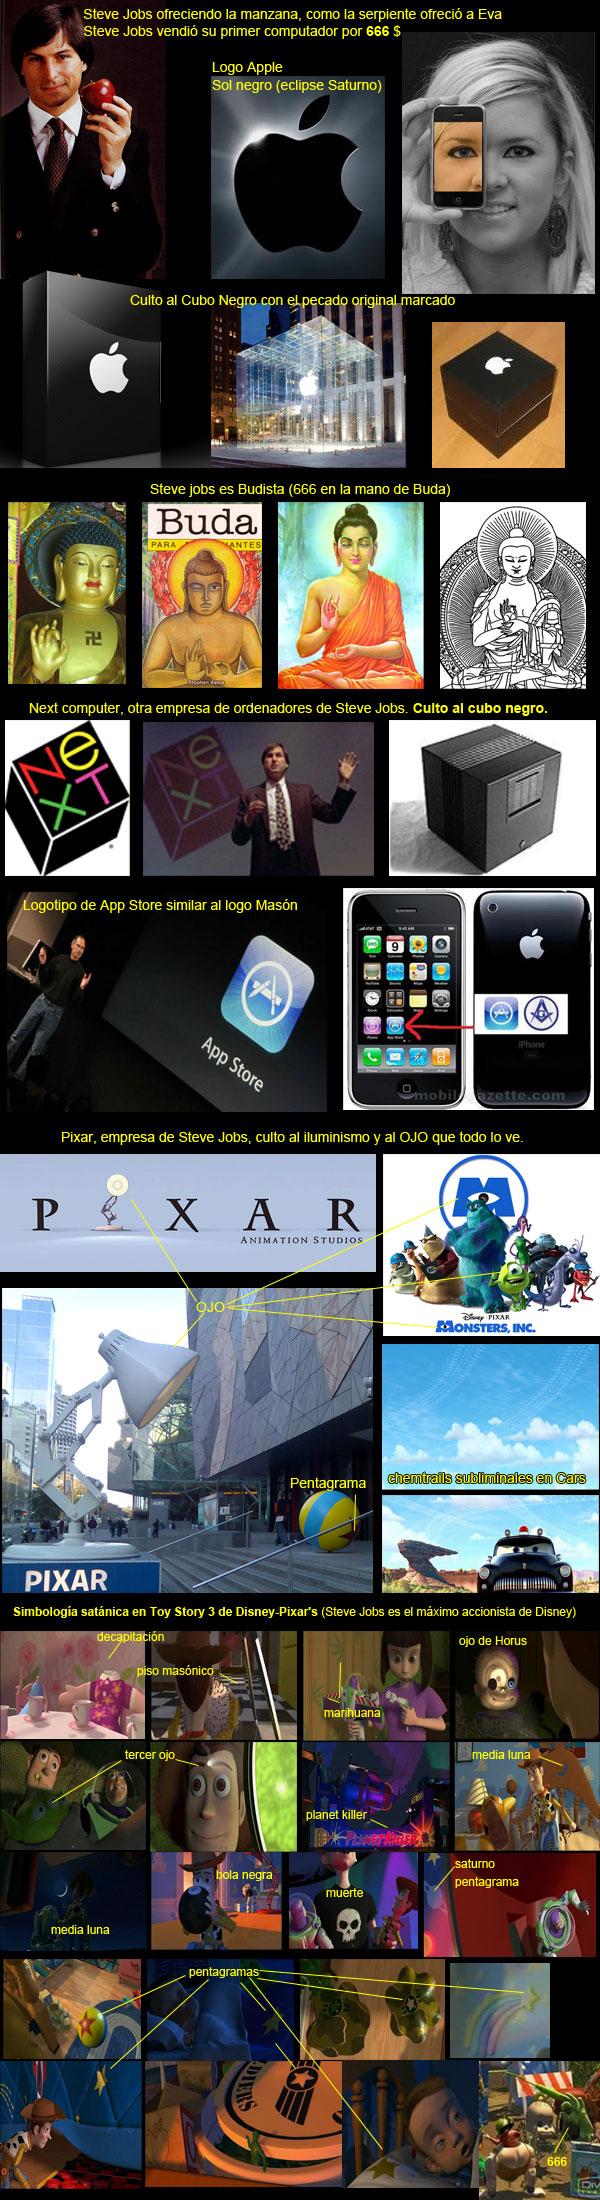 Winnie the Pooh de Disney. Mensajes subliminales Apple-steve-jobs-satan-saturno-666-toy-story3-disney-satanic-chemtrails-cars